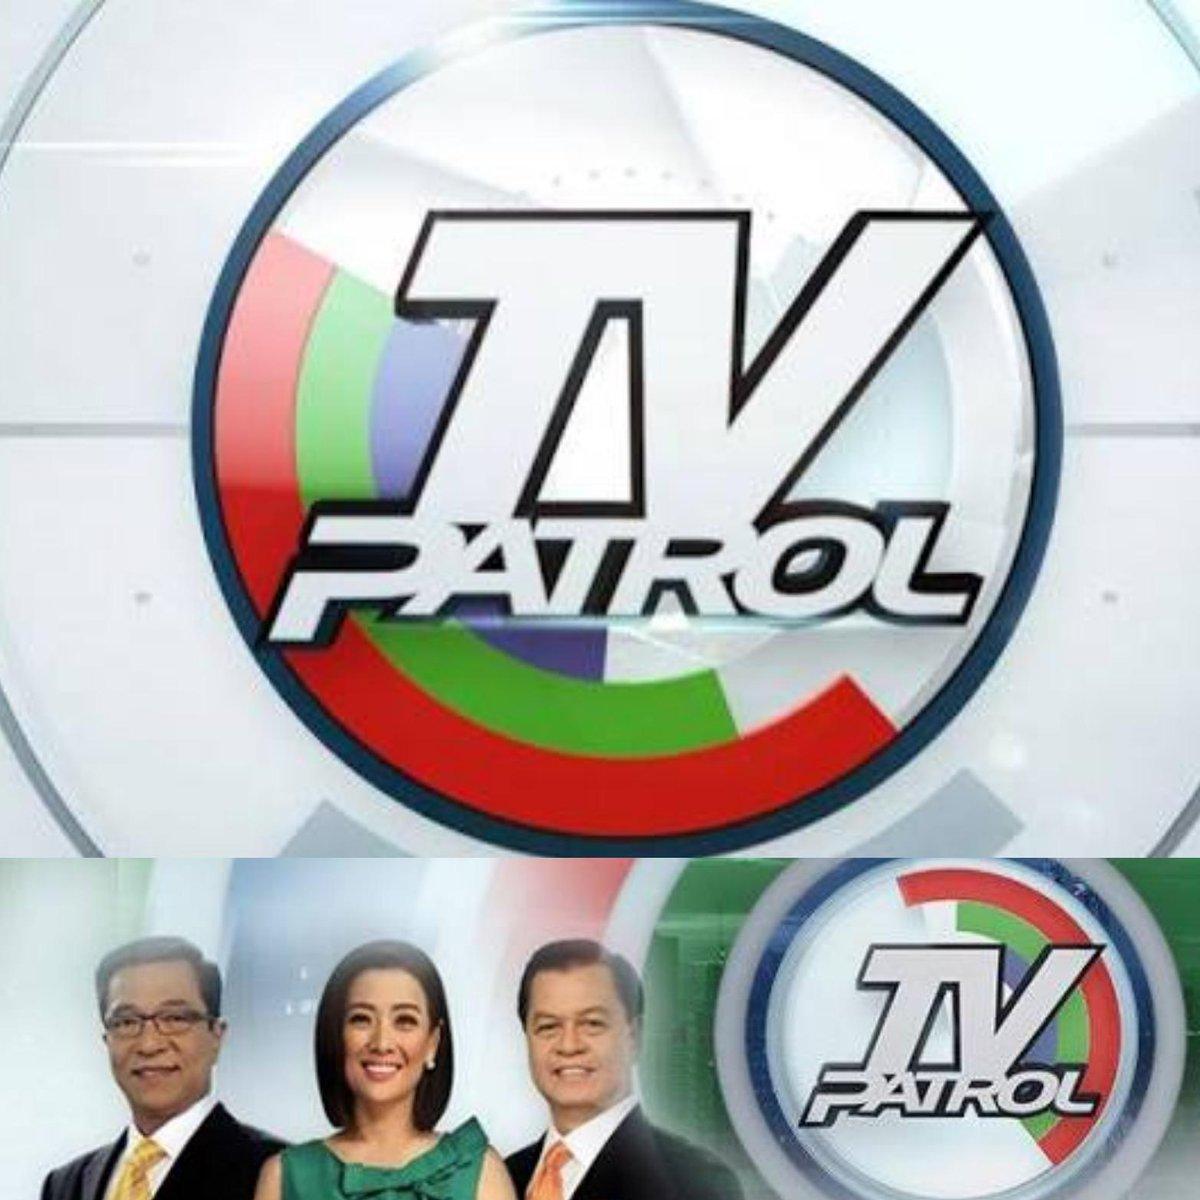 Tv p͏a͏t͏r͏o͏l - Tv p͏a͏t͏r͏o͏l (2019)